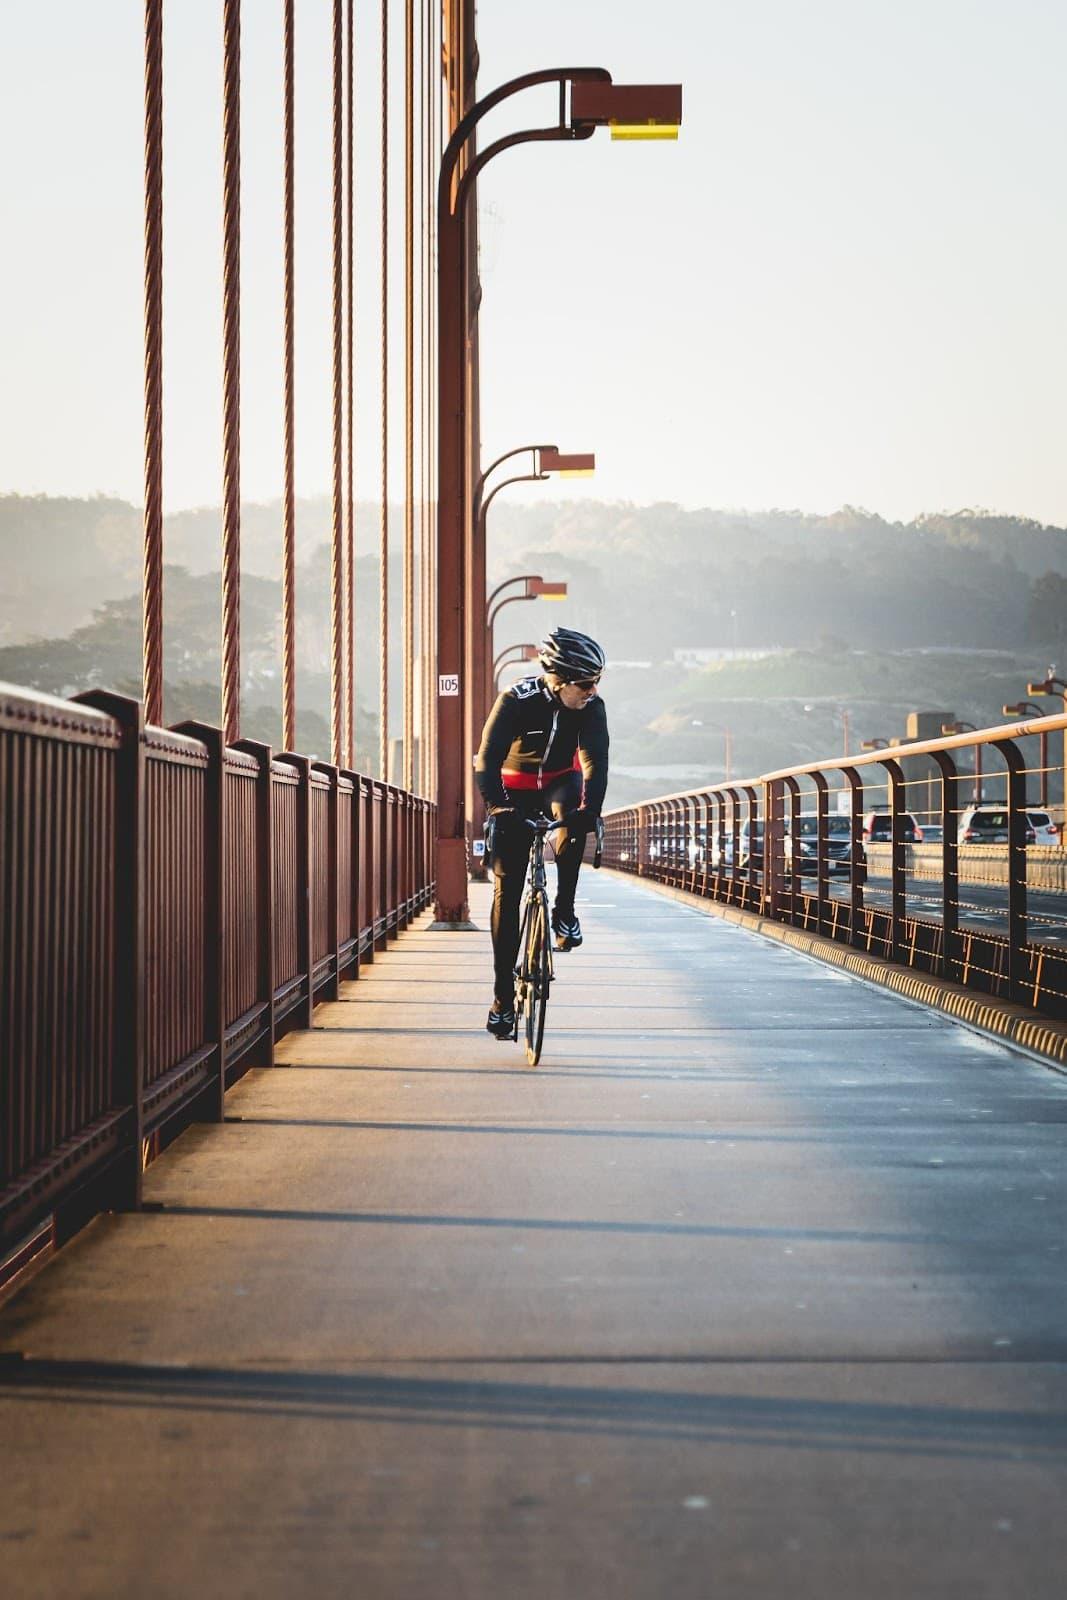 cyclist riding on bridge towards camera